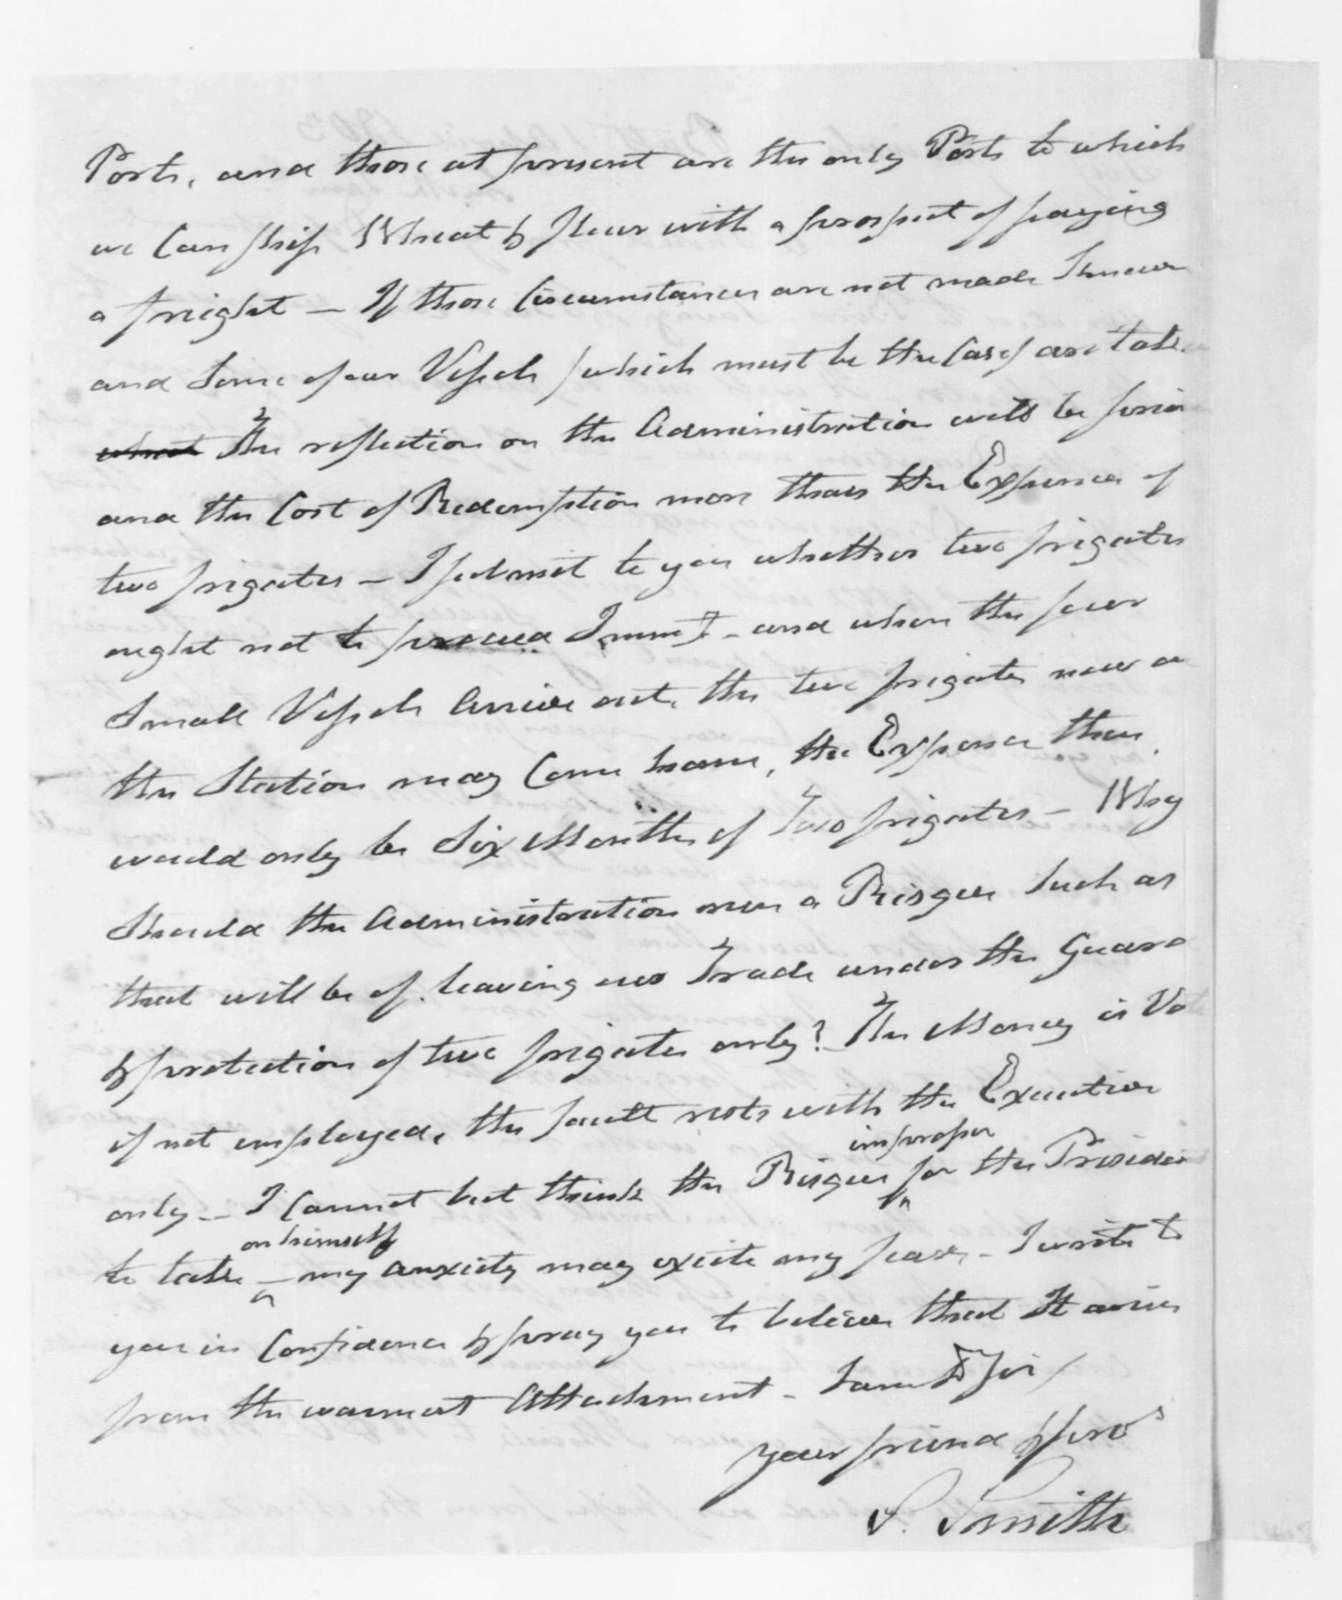 Samuel Smith to James Madison, April 1, 1803.